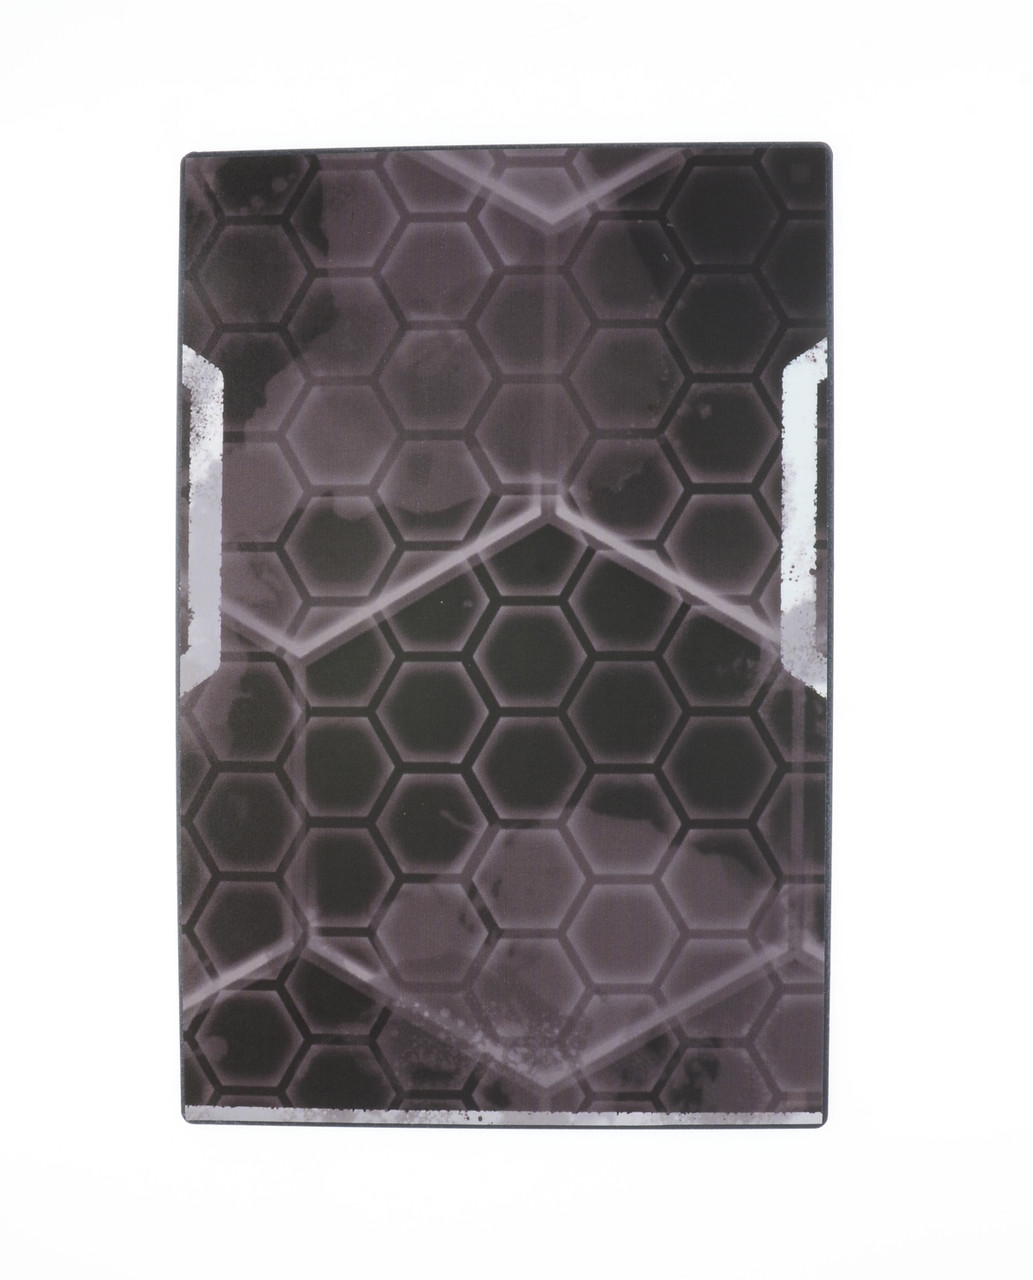 HYPERshoot Blank Coin/DBA Plate (HSH-FM-078-R0)